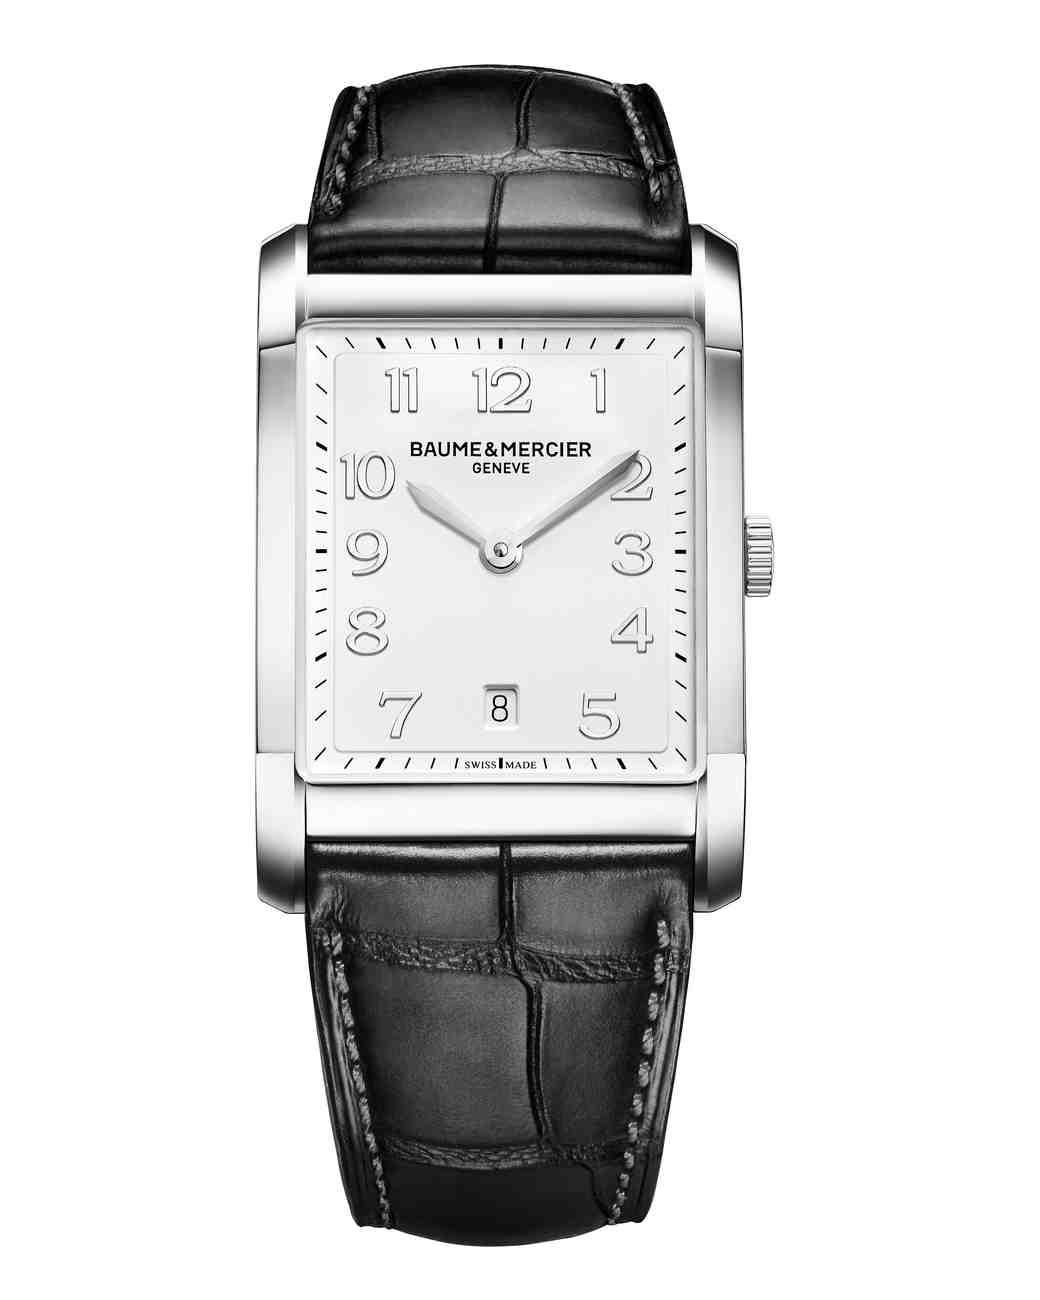 baume-mercier-watch-hampton-10154-0514.jpg